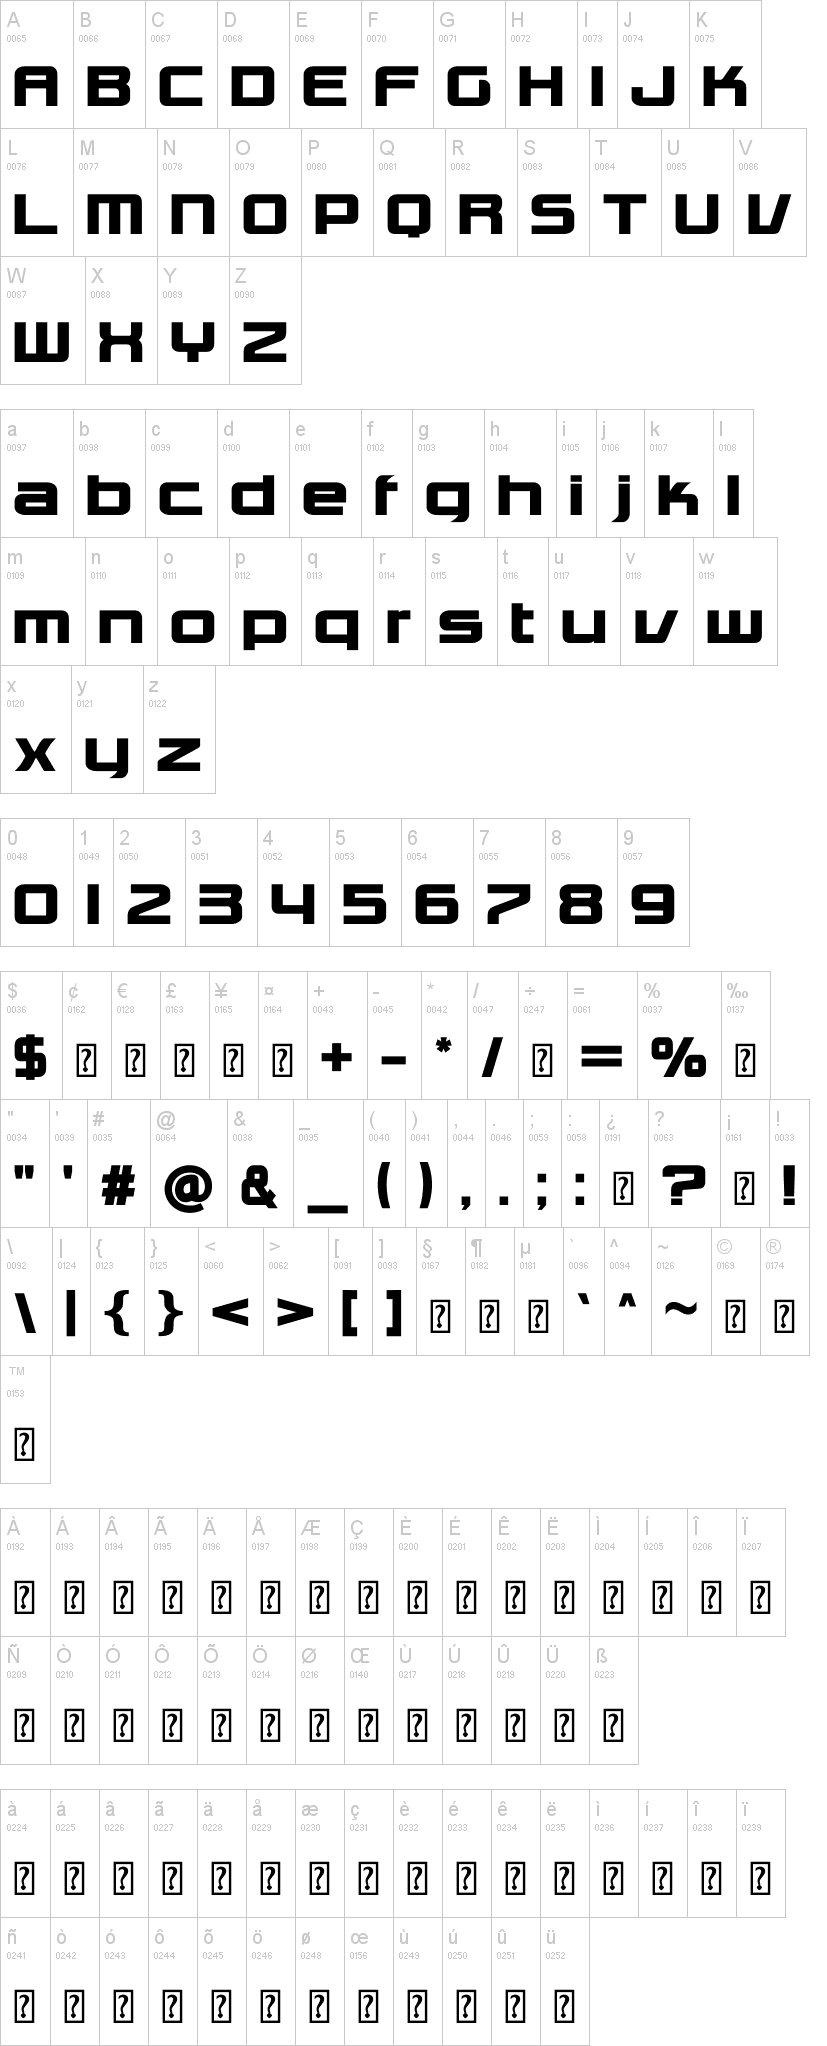 LL Brown font Fonts Free Download